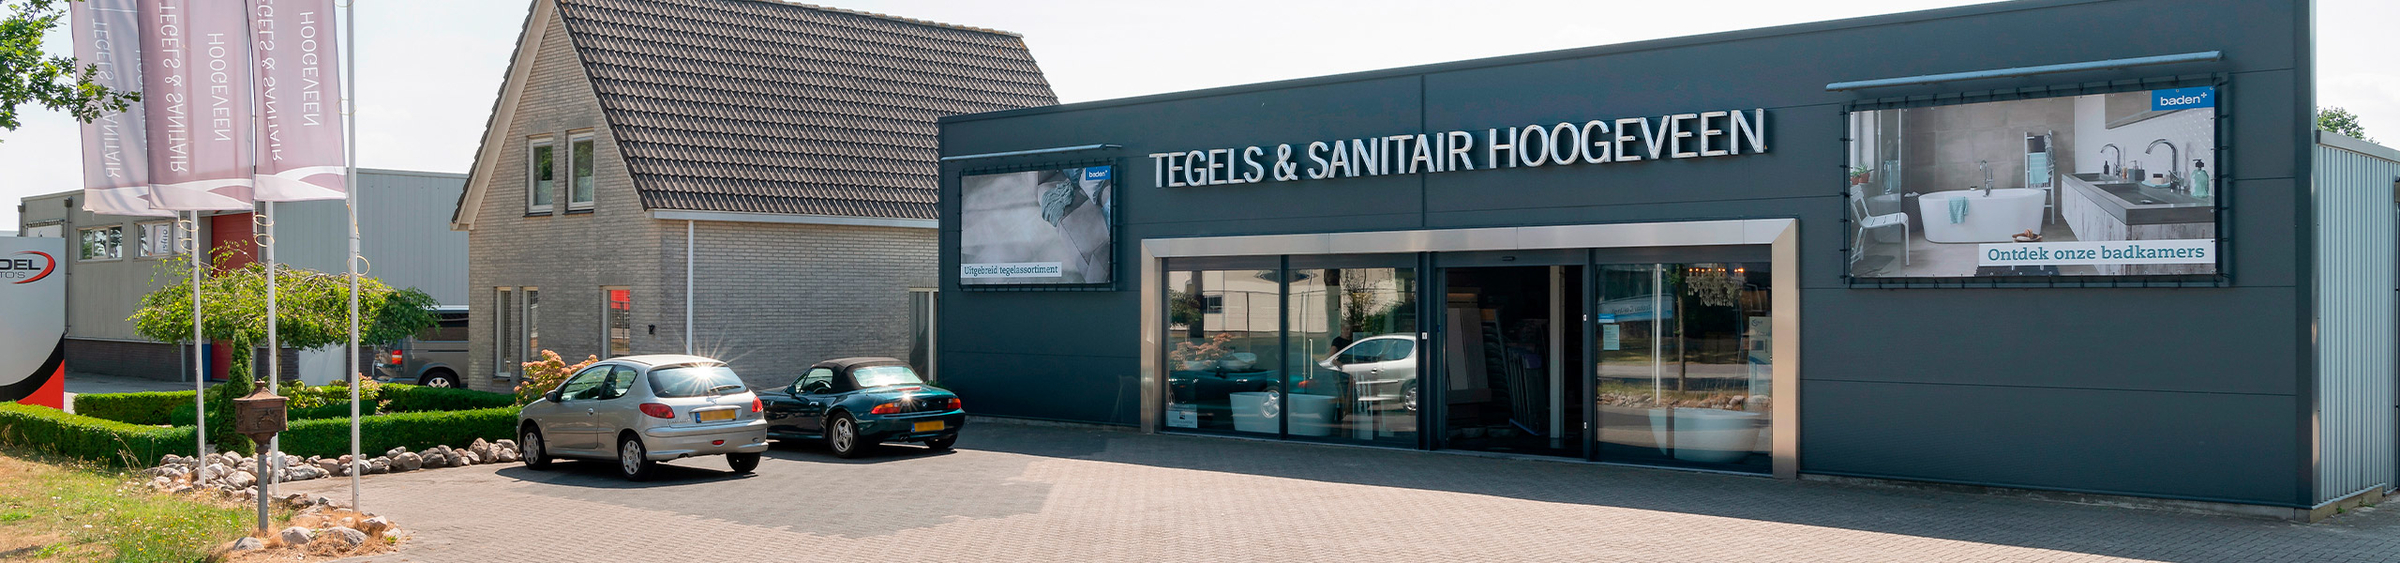 Tegels & Sanitair Hoogeveen - Tegels & Sanitair Hoogeveen